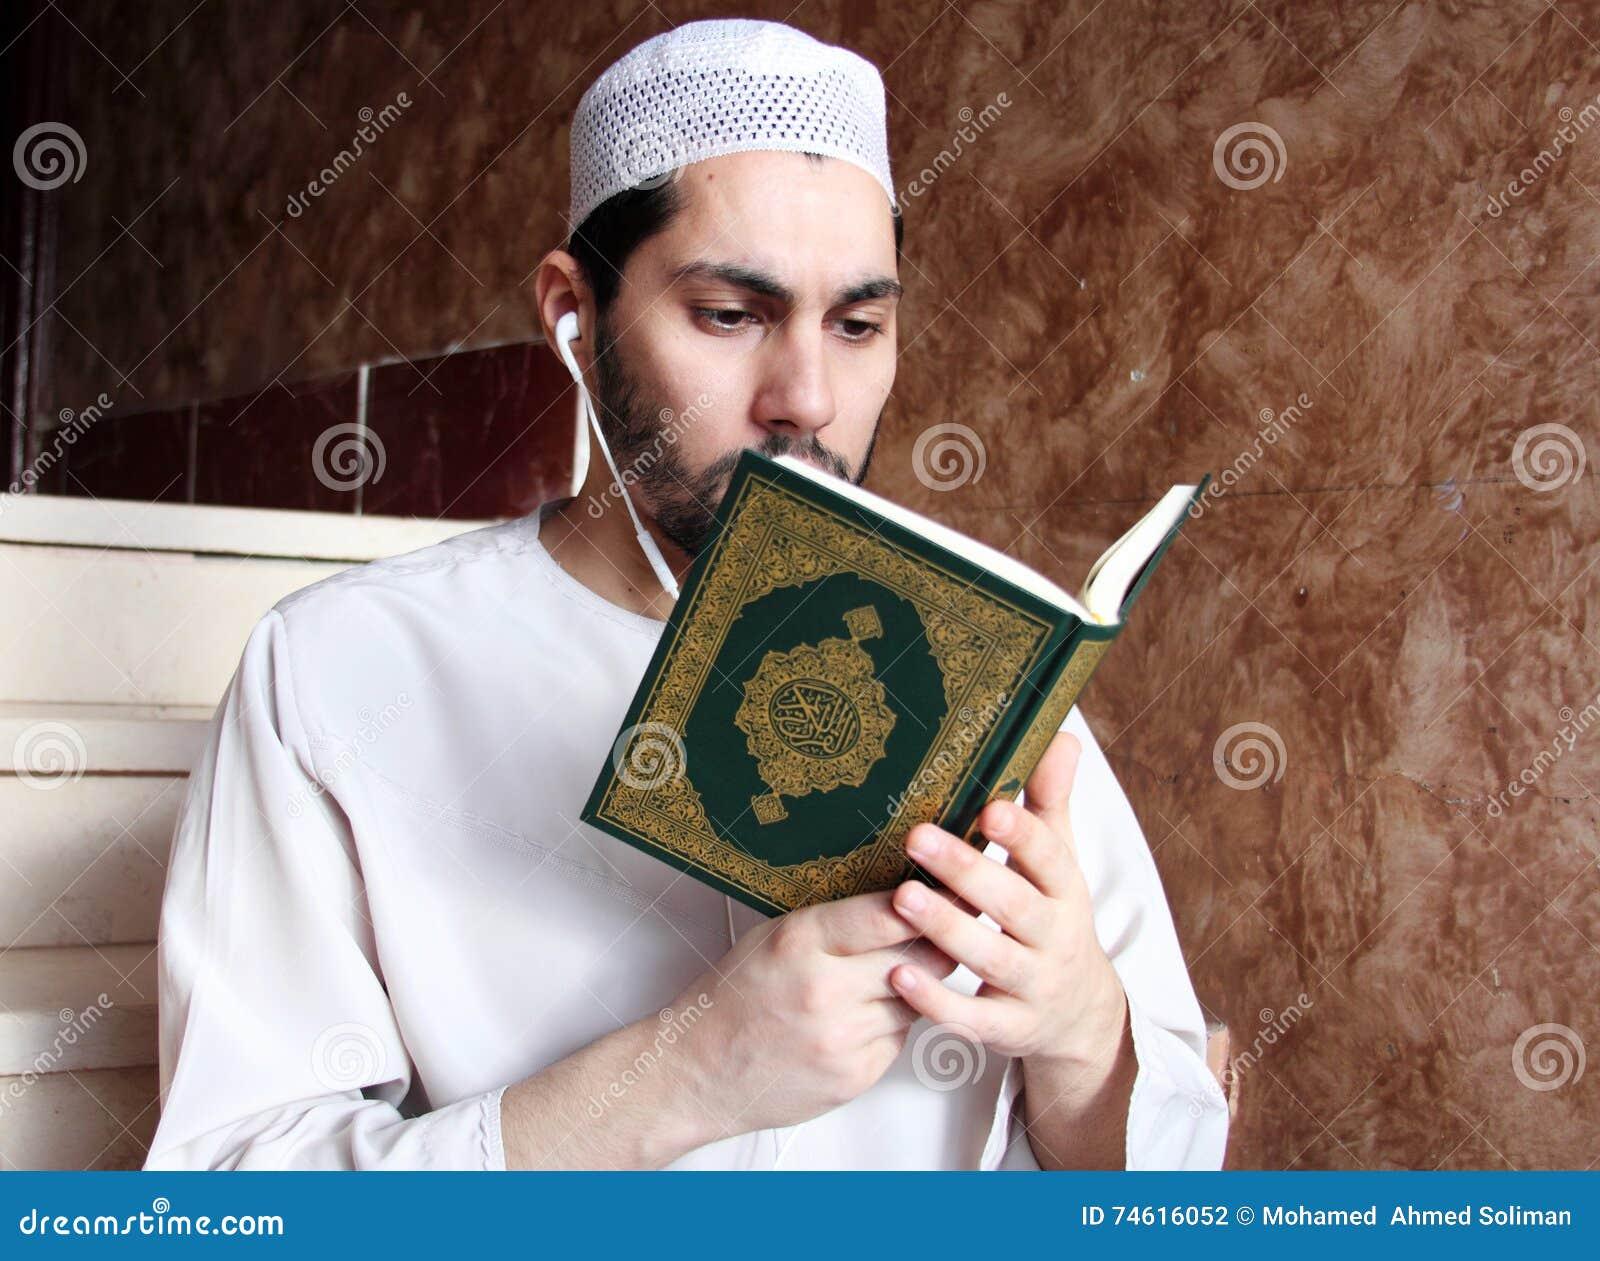 muslim playing